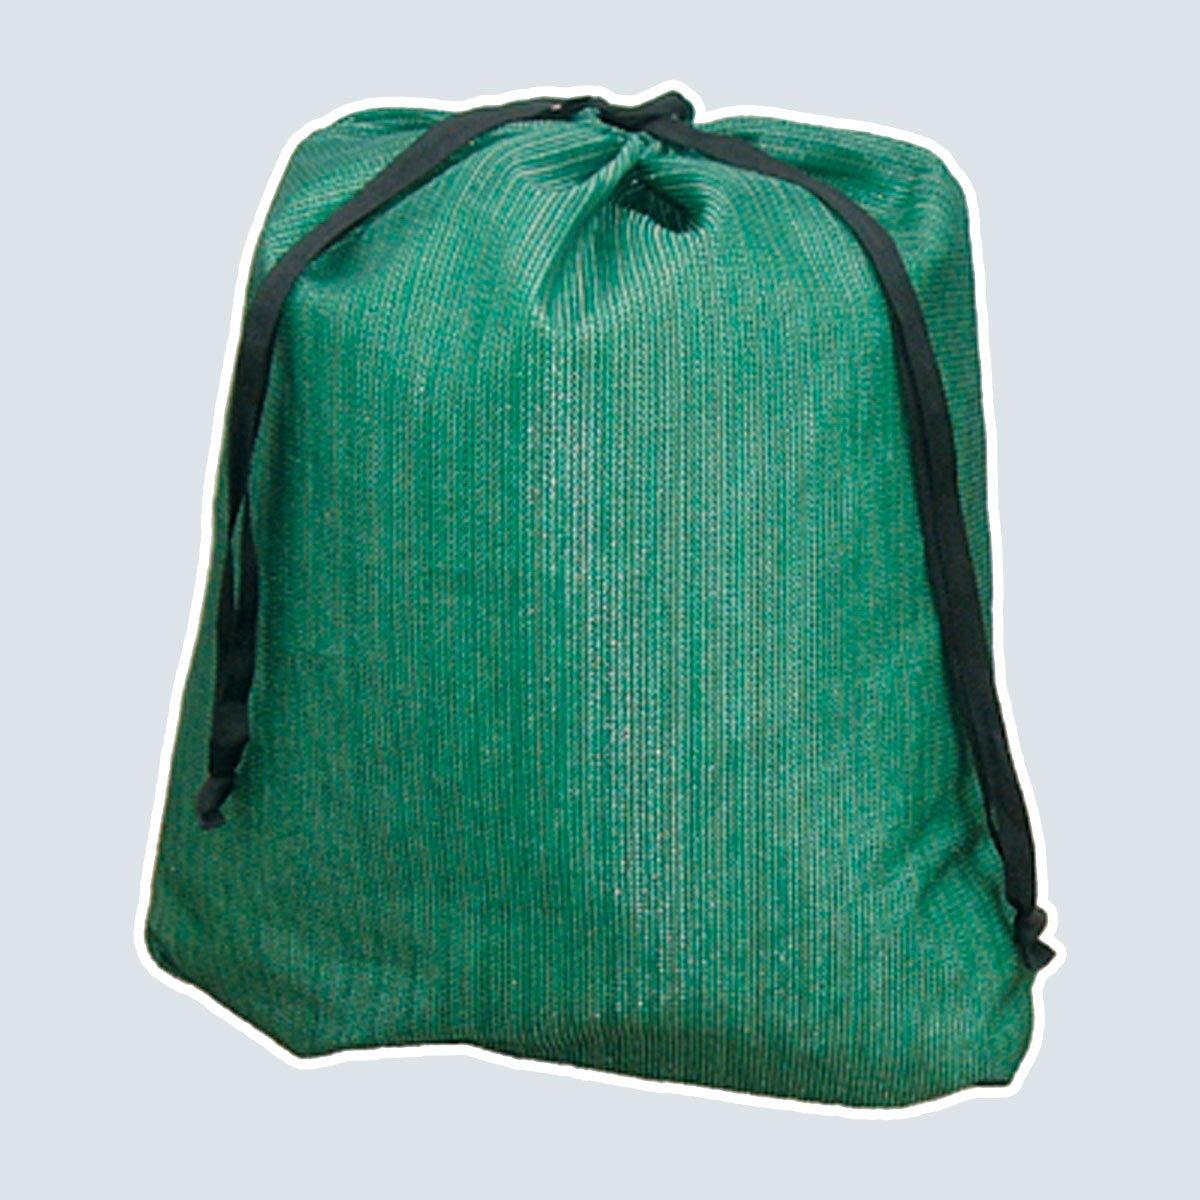 Reusable Compost Bags